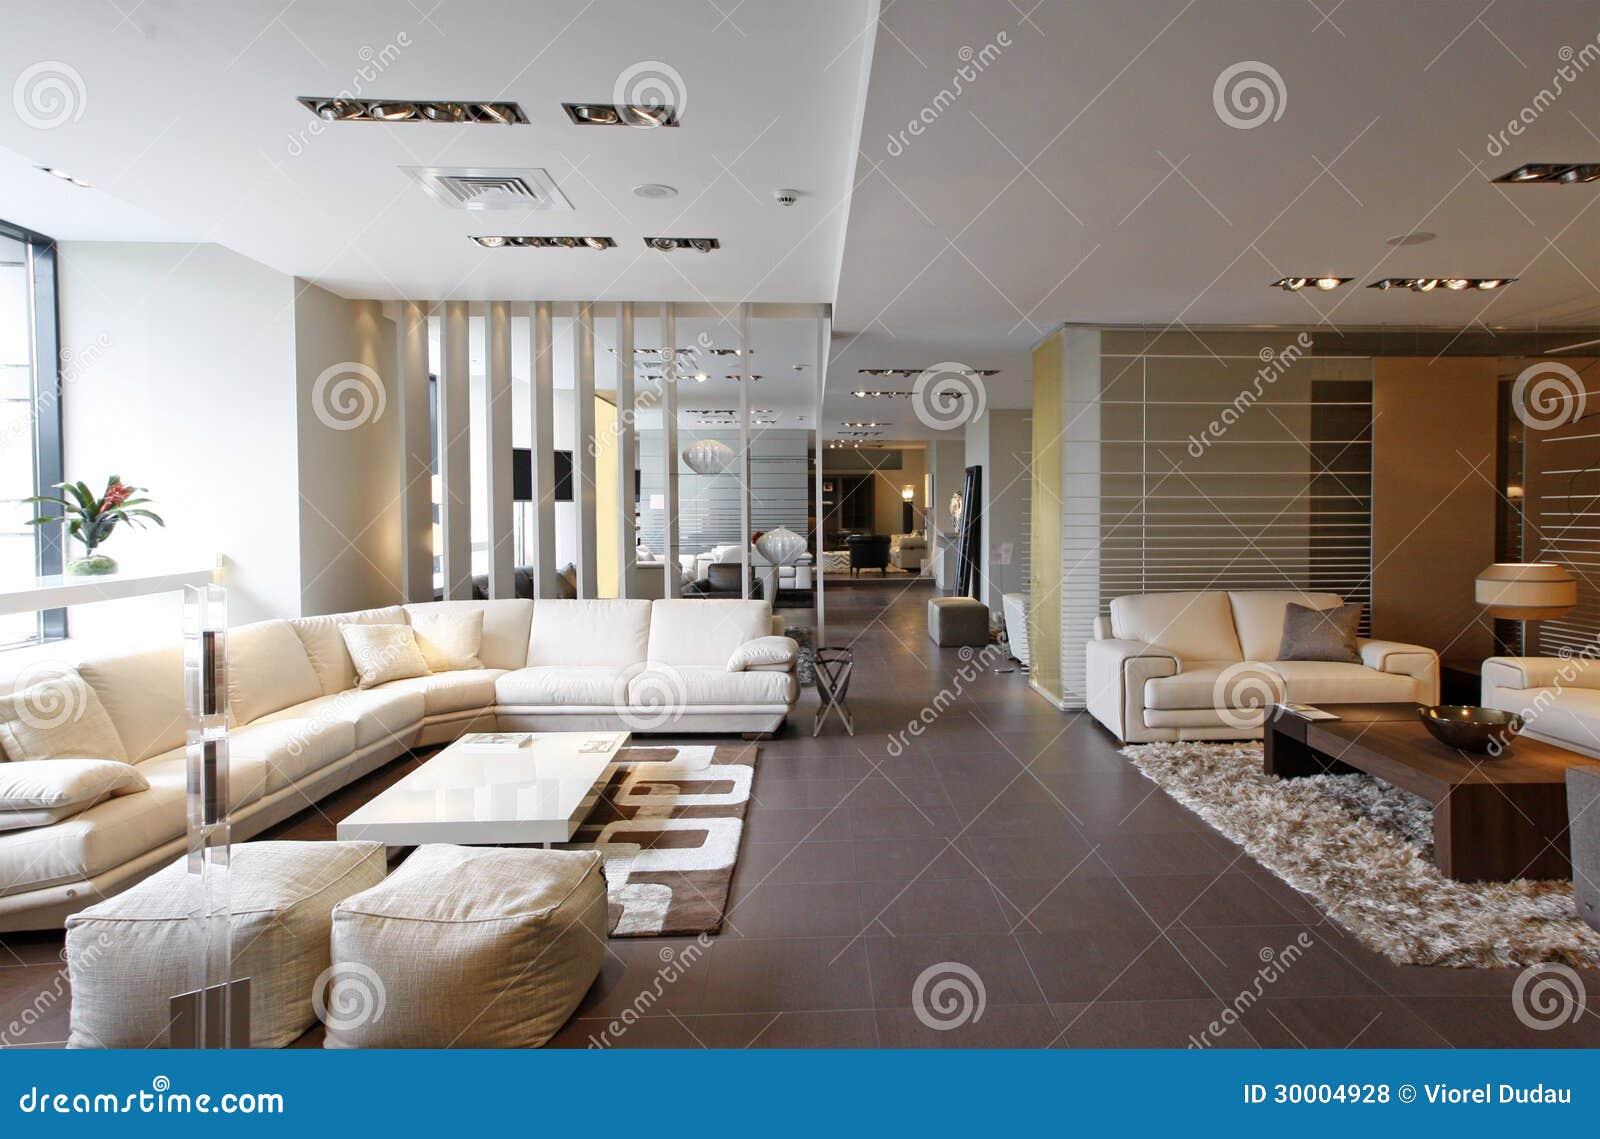 ... Living Room Sitting Area Furniture. on living room furniture store